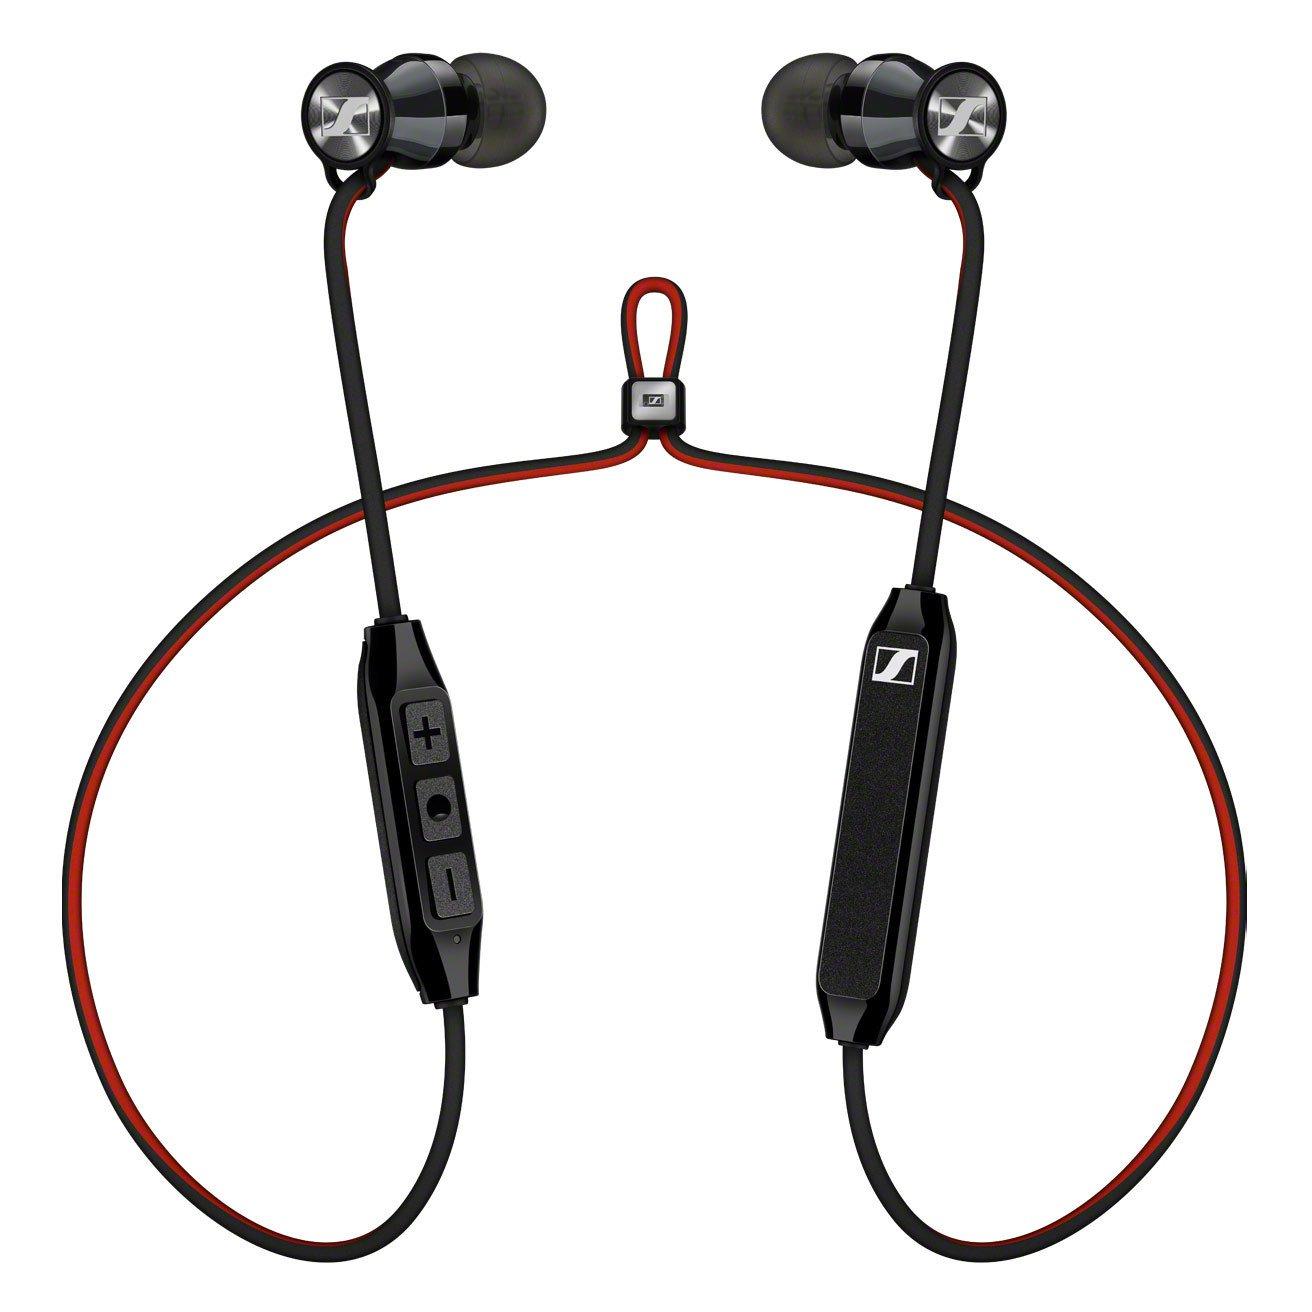 Sennheiser Momentum Free In-Ear Headphones Image